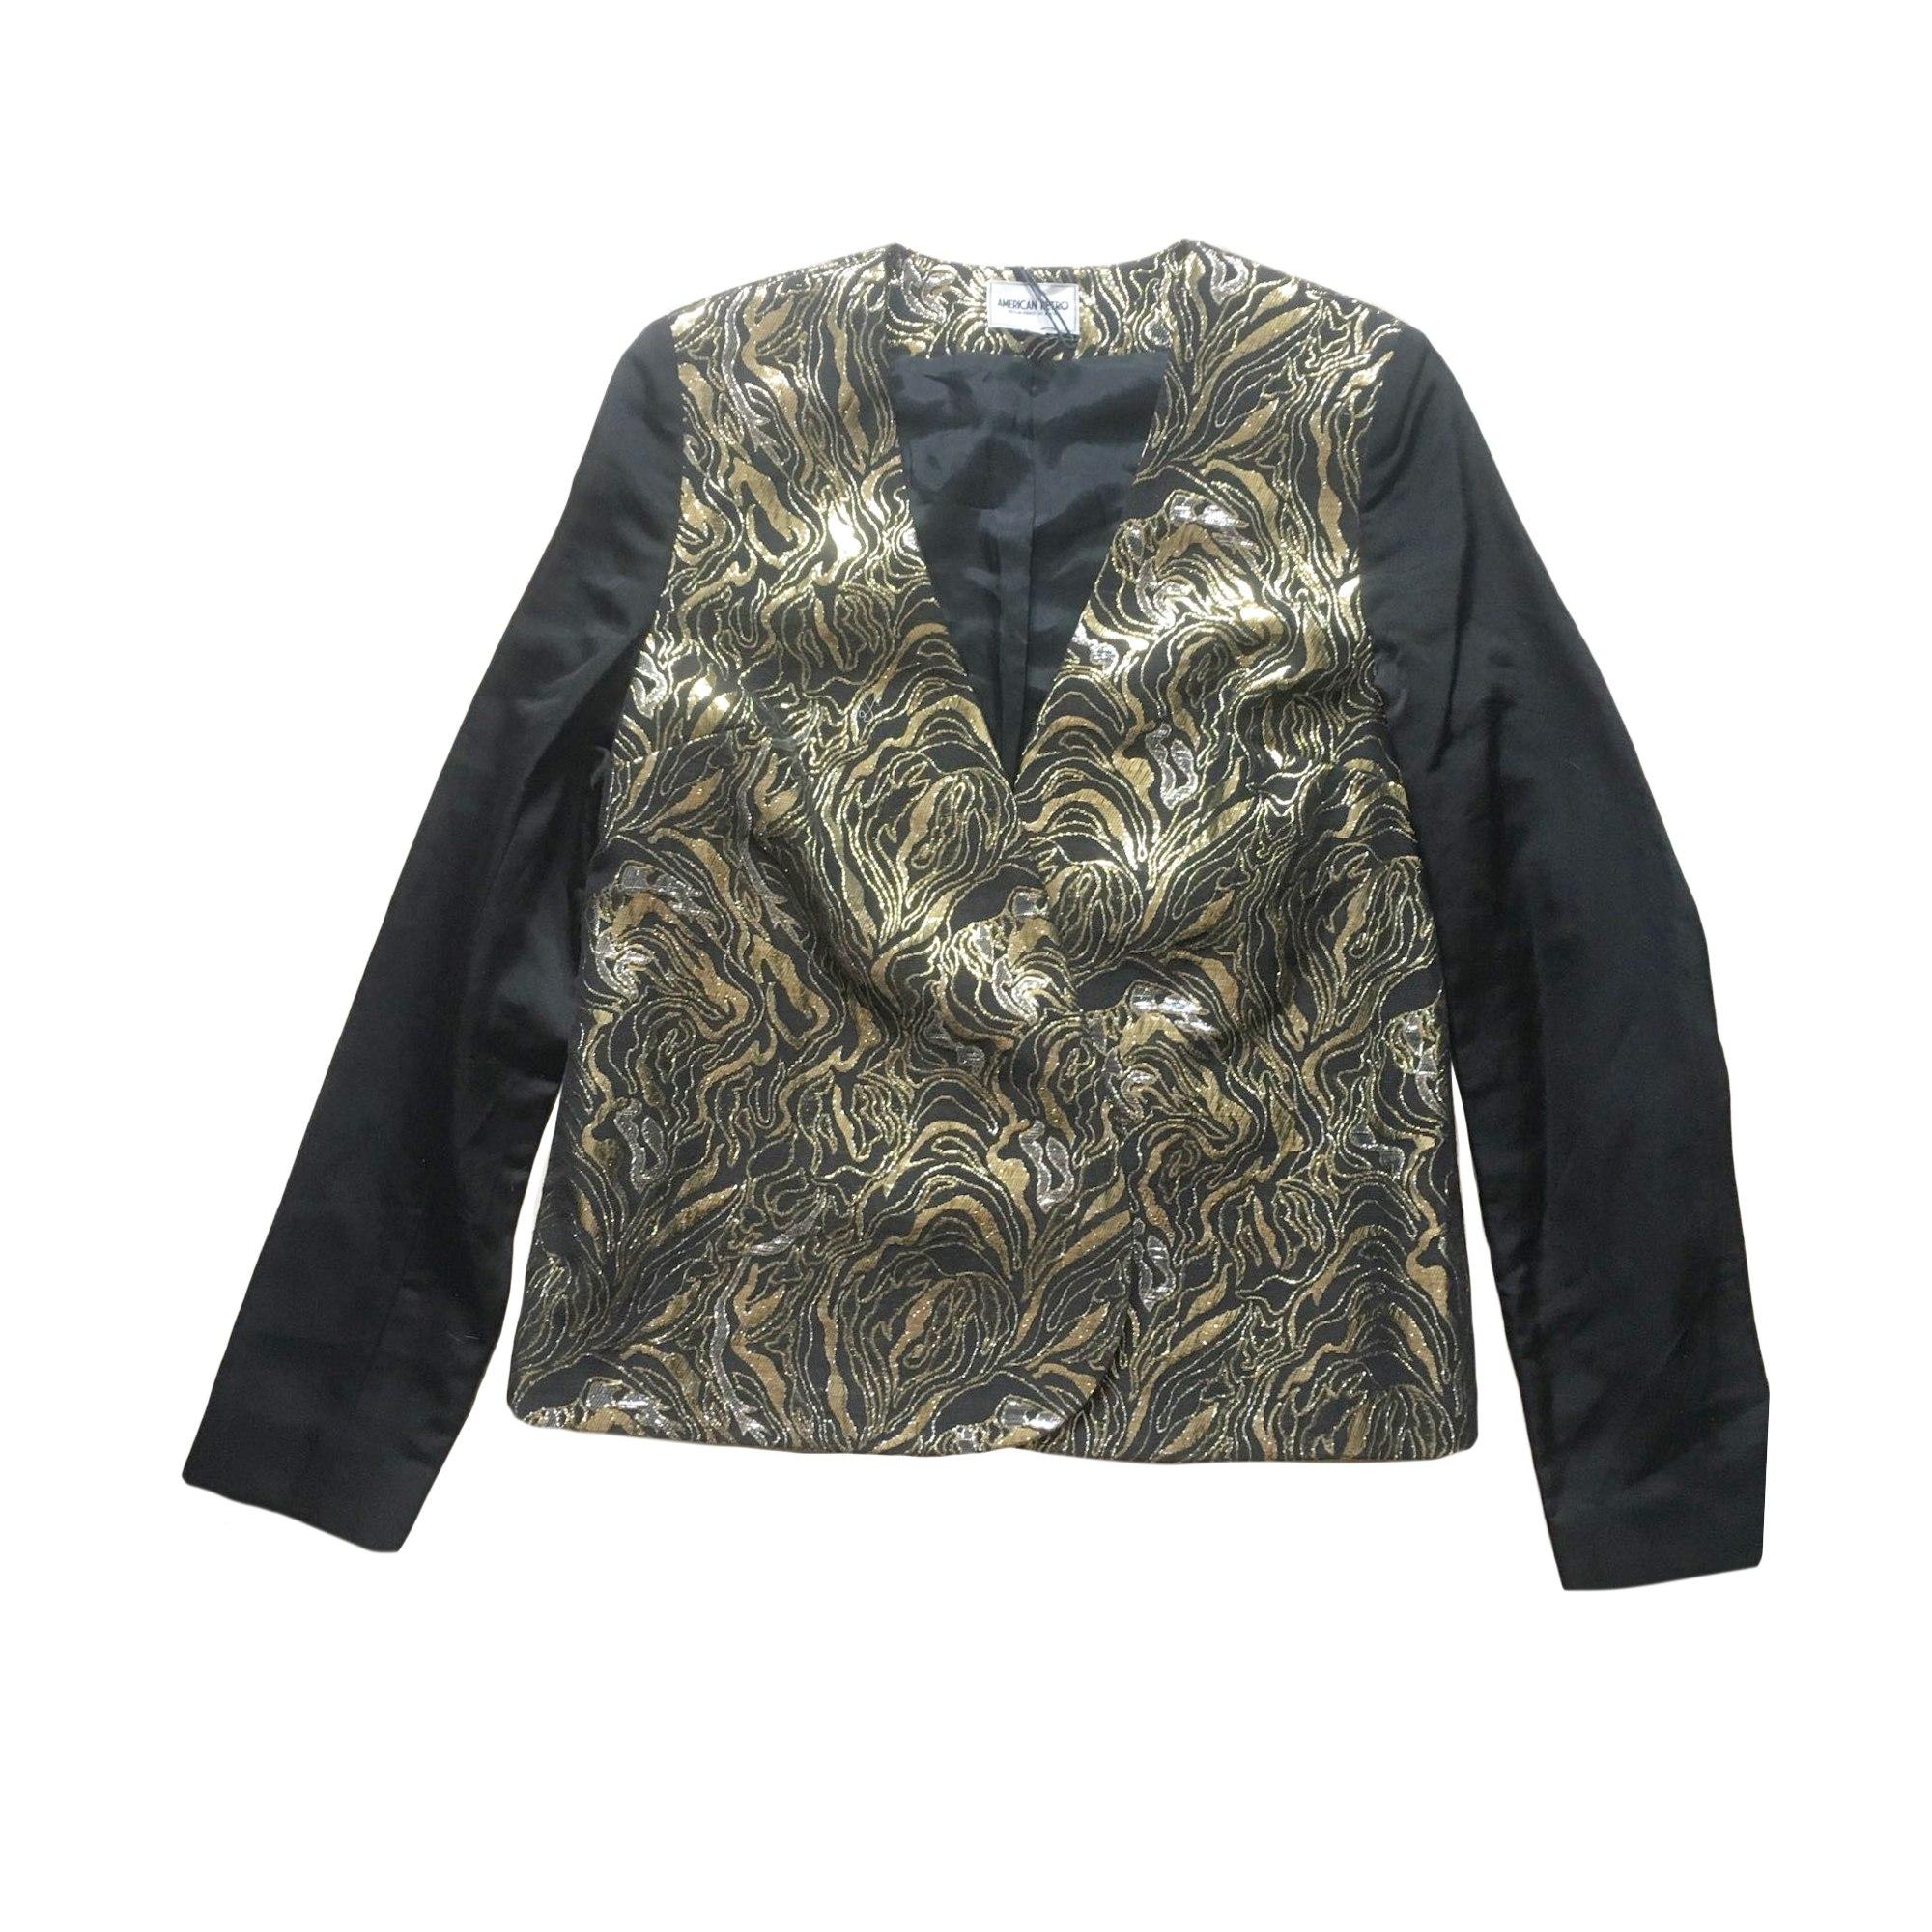 Blazer, veste tailleur AMERICAN RETRO Doré, bronze, cuivre